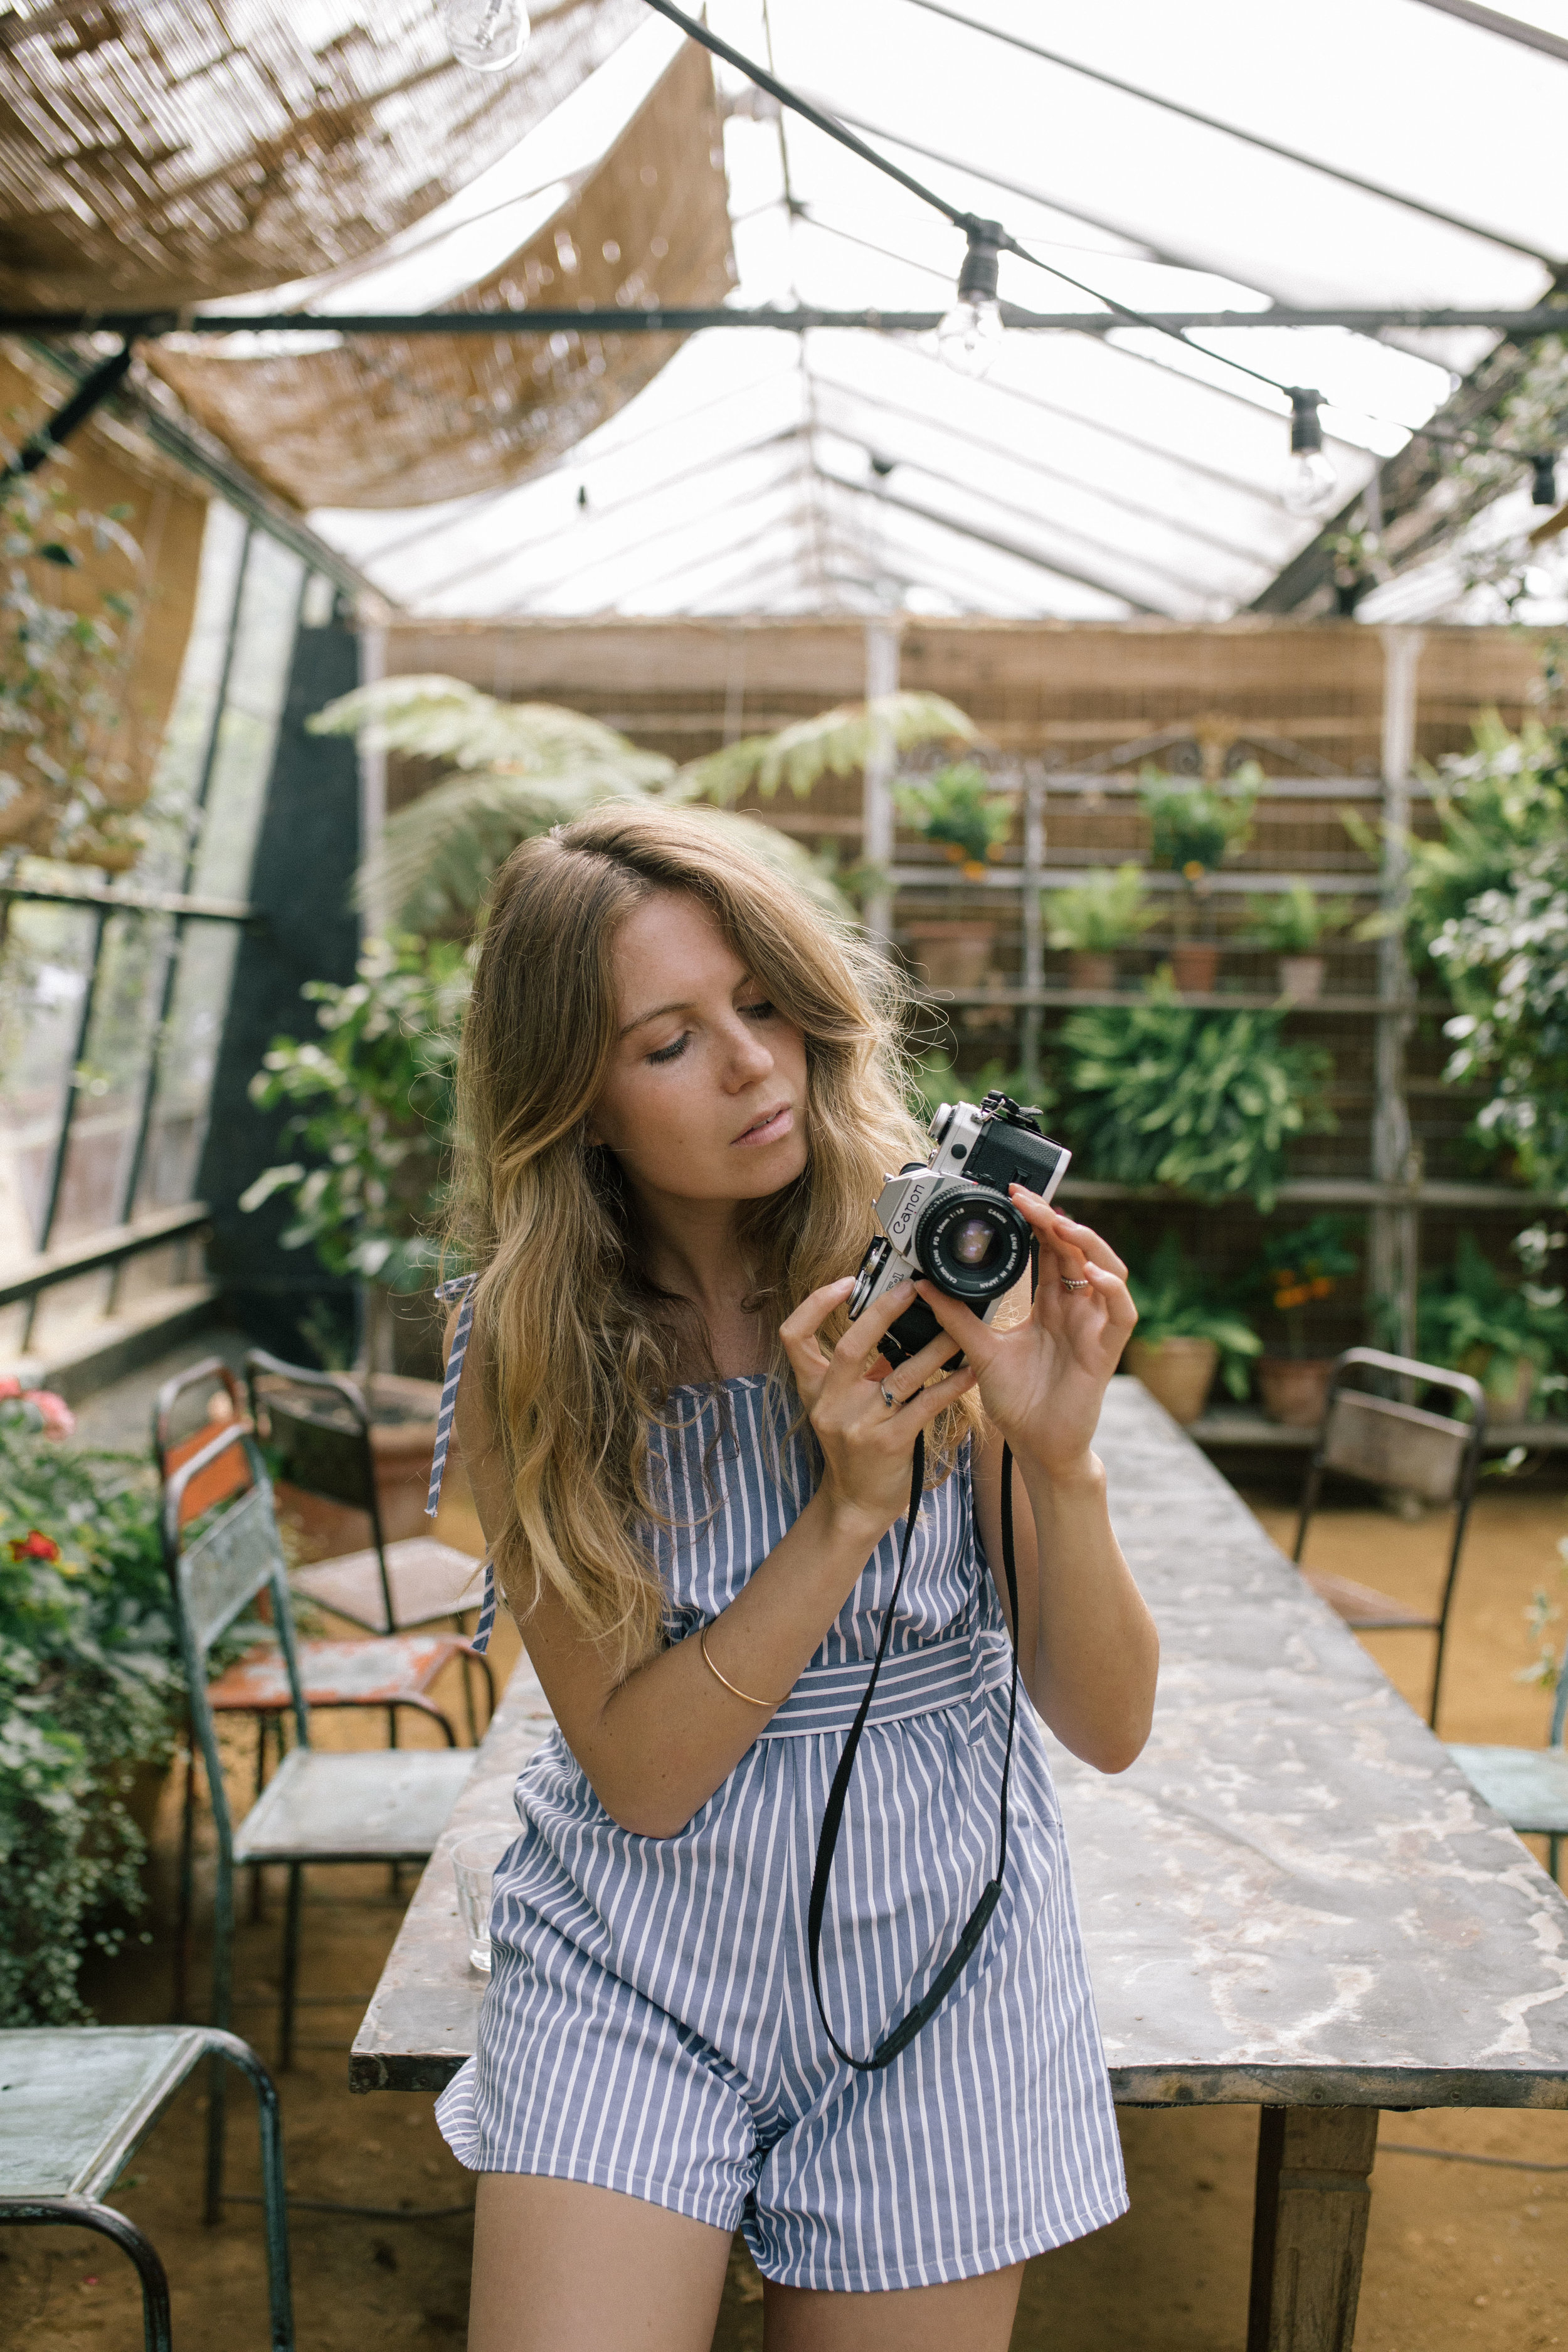 Tania Gault | Lifestyle, Food, Travel Photographer